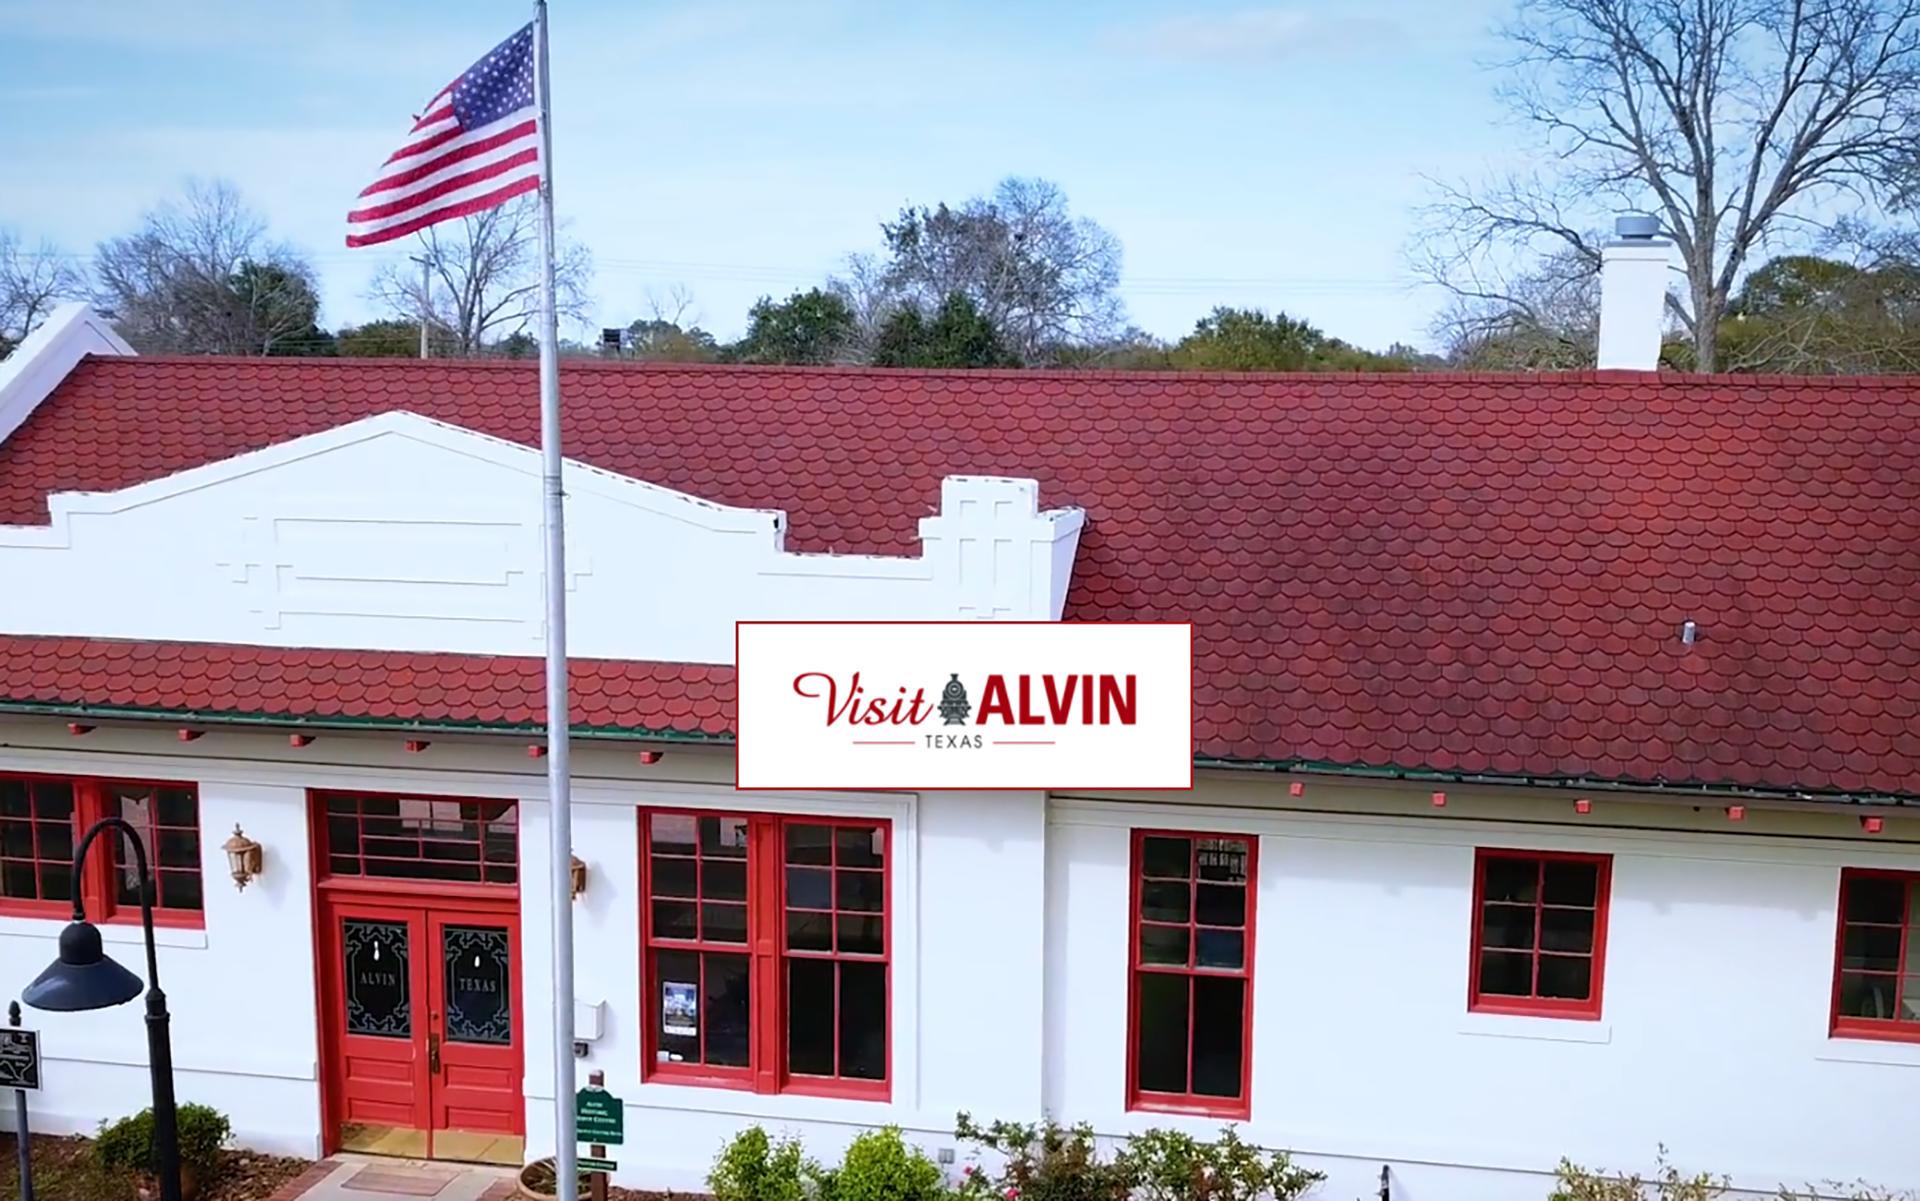 Visit Alvin 1920 x 1200